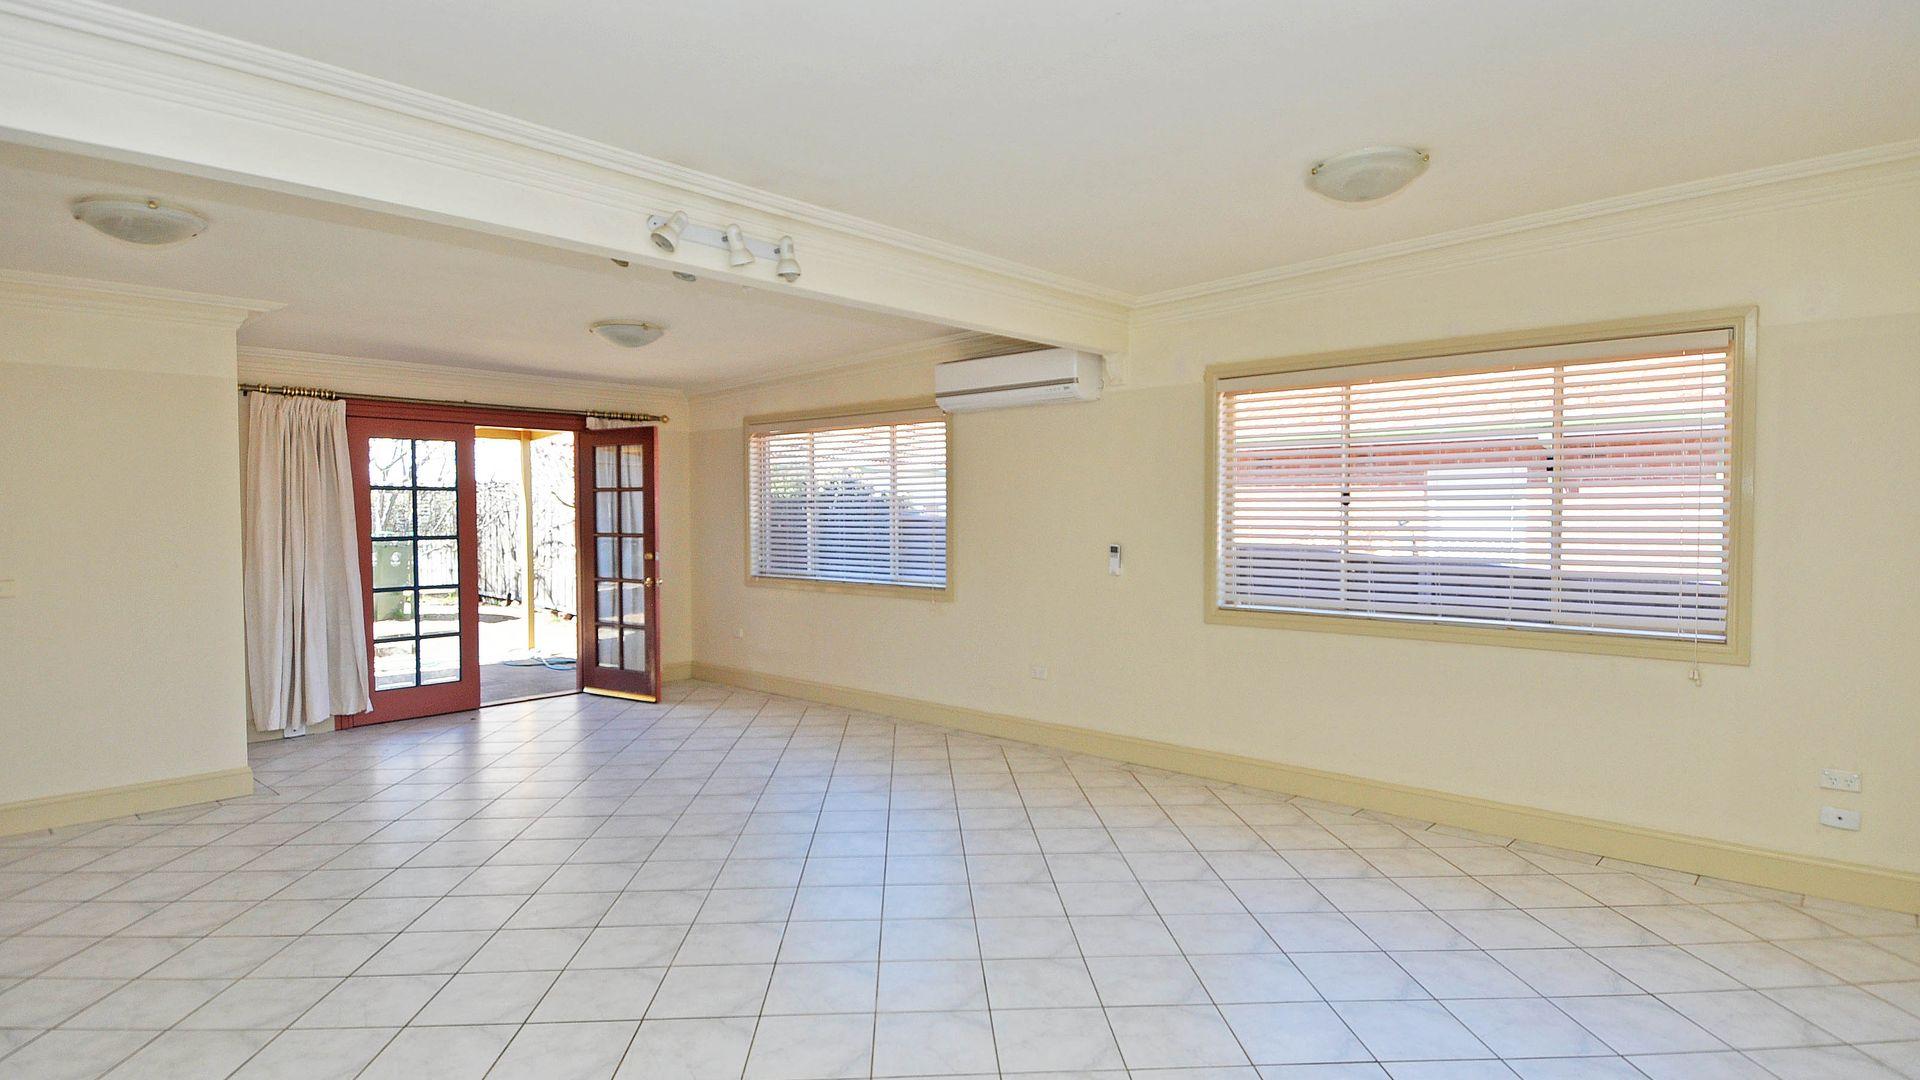 15 Blandford Street, Bathurst NSW 2795, Image 1